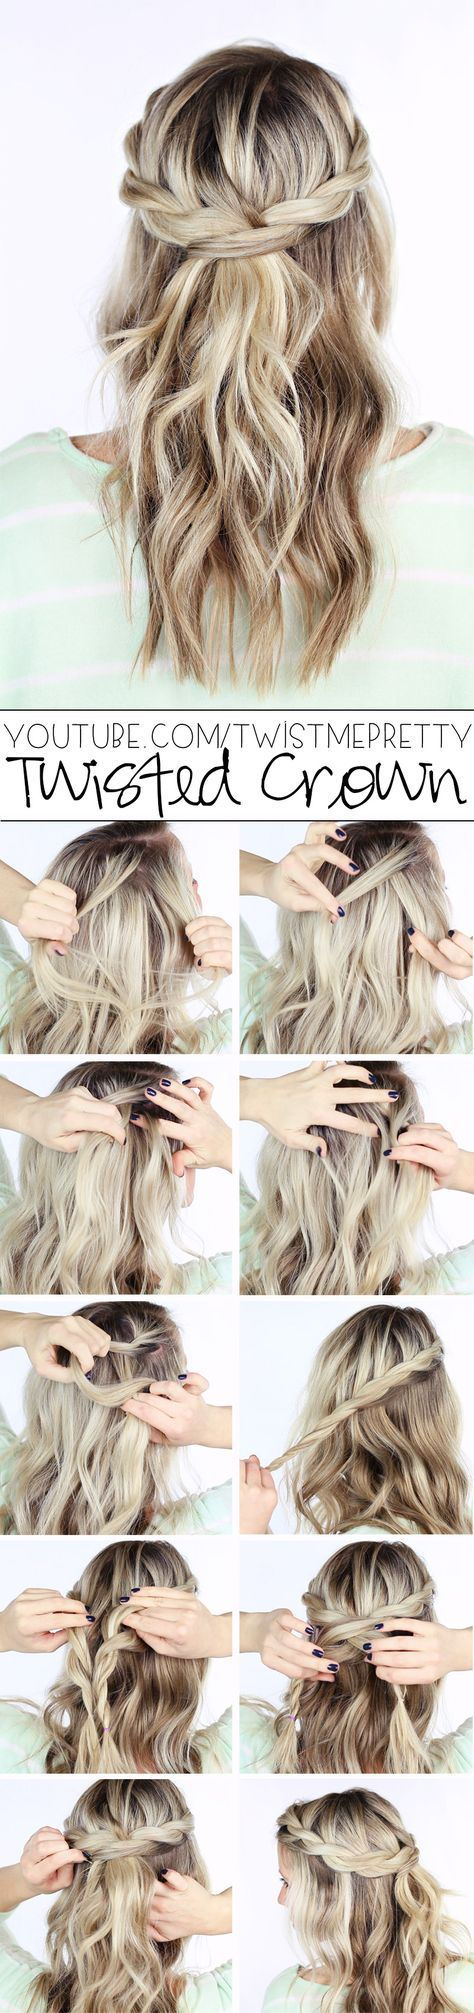 Twisted Crown Braid Tutorial Twist Me Pretty In 2020 Long Hair Styles Pinterest Hair Hair Styles